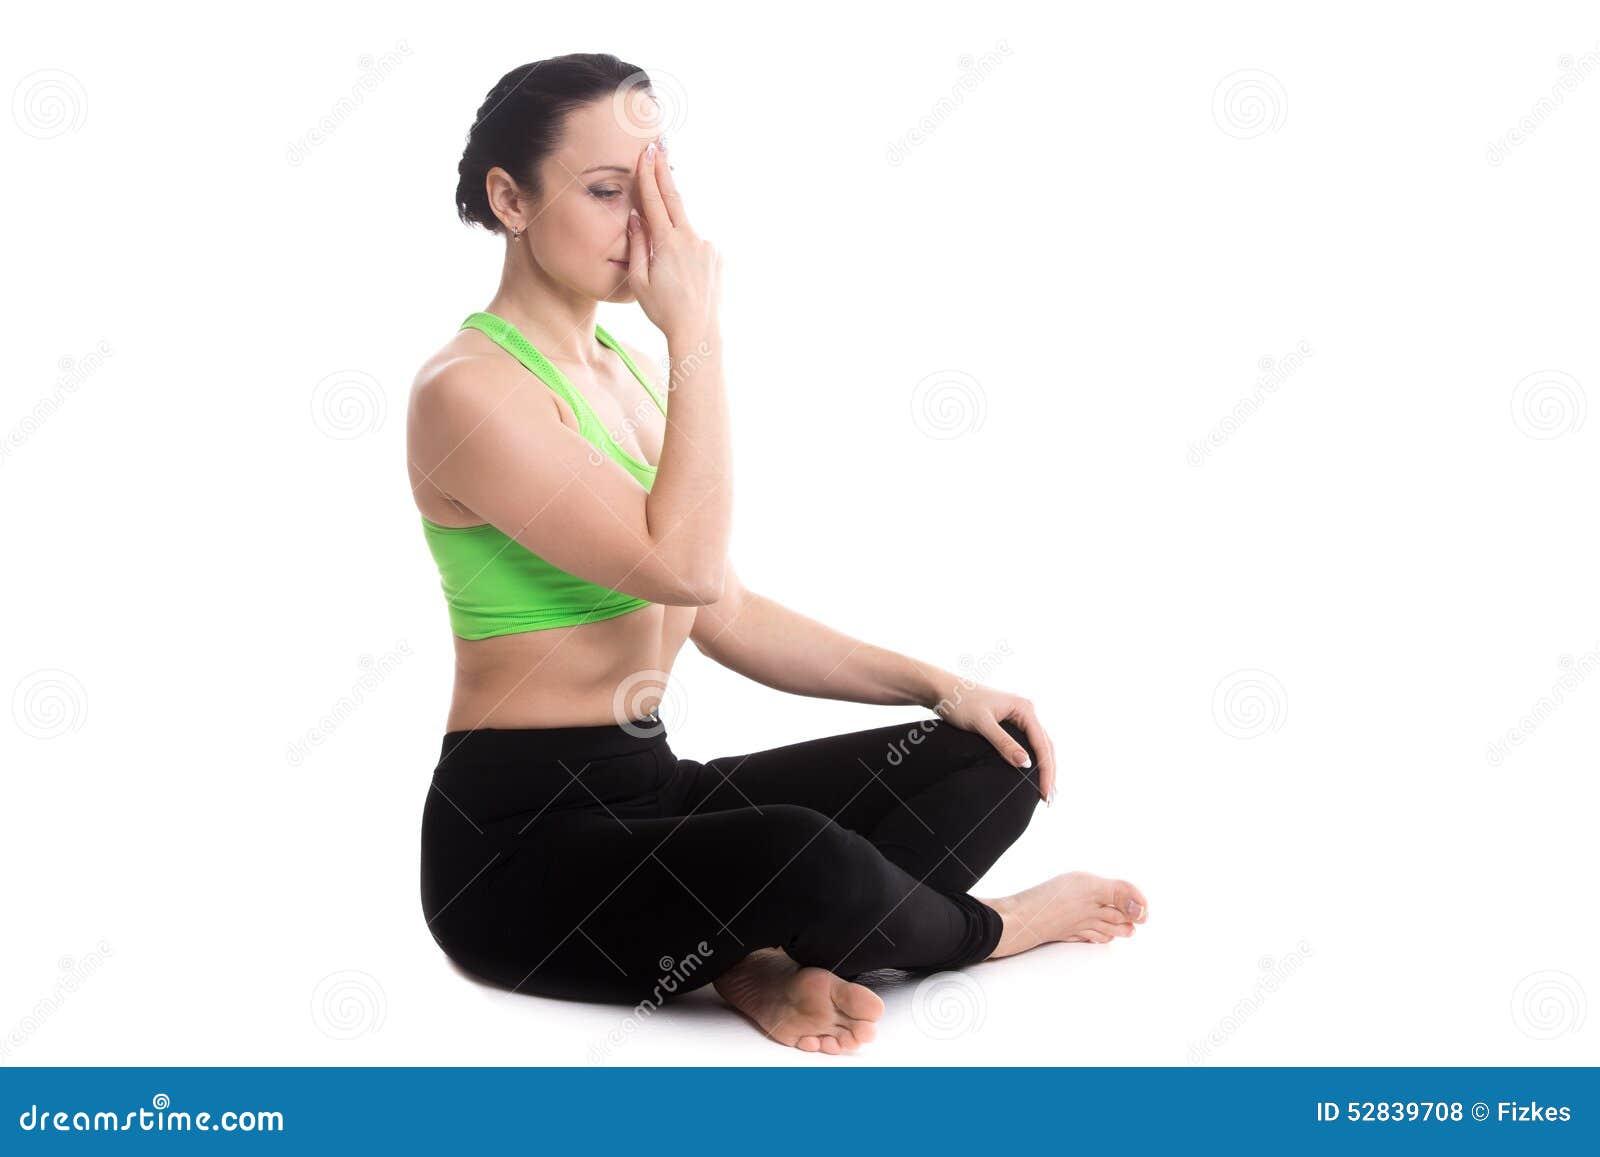 Nadi Shodhana Pranayama In Yoga Easy Pose Stock Photo